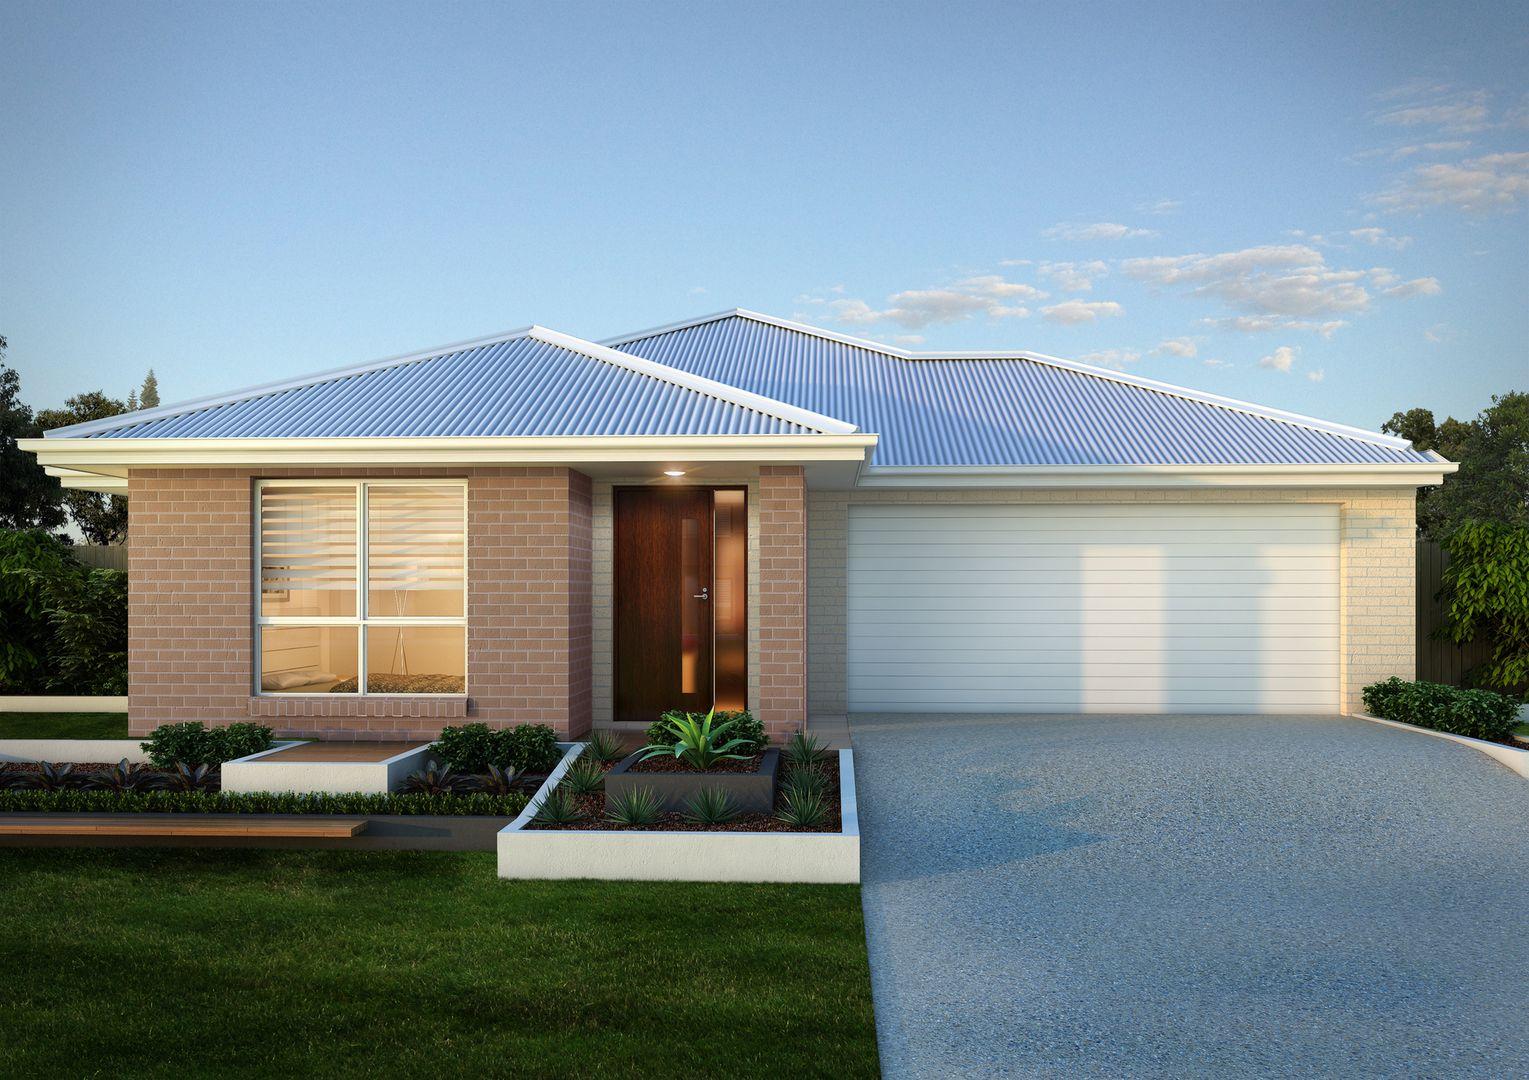 Lot 156 Mulga Place (Moore Creek Gardens), Moore Creek NSW 2340, Image 0